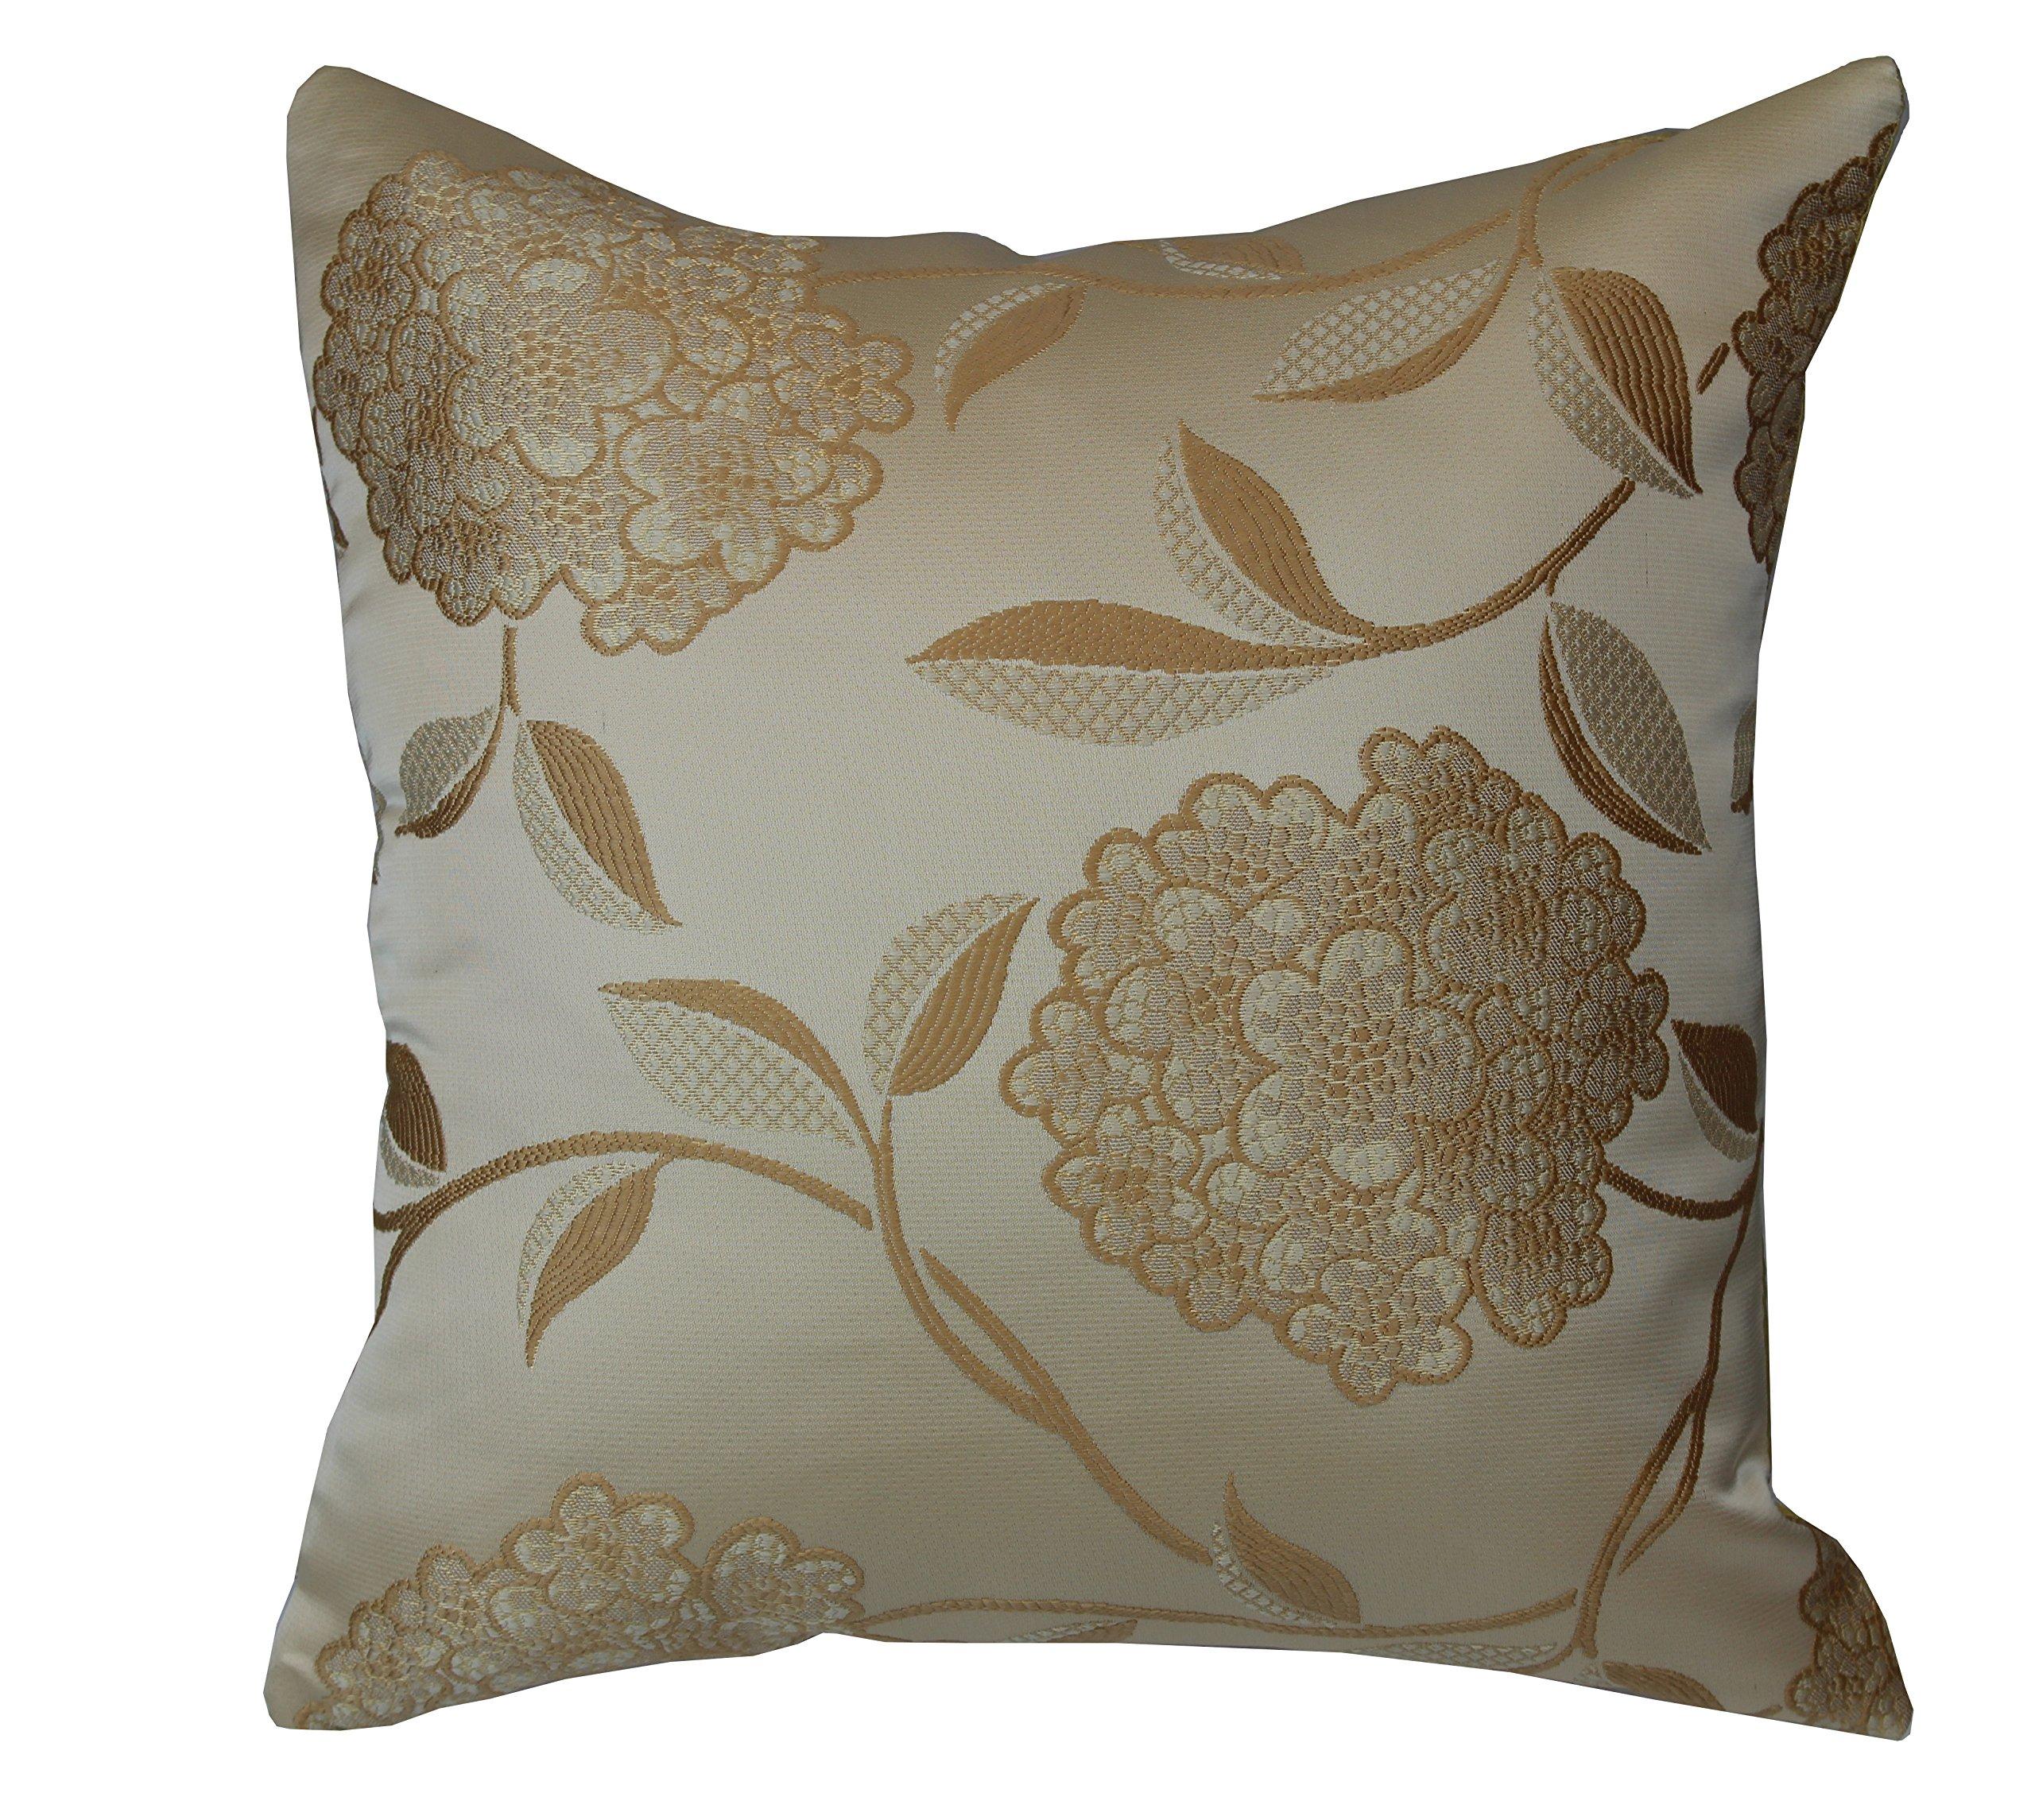 Violet Linen VL-68875-VENETIAN-PILLOW-GL Vintage Collection Luxurious Venetian Decorative Throw Pillow, 18'' x 18'', Gold